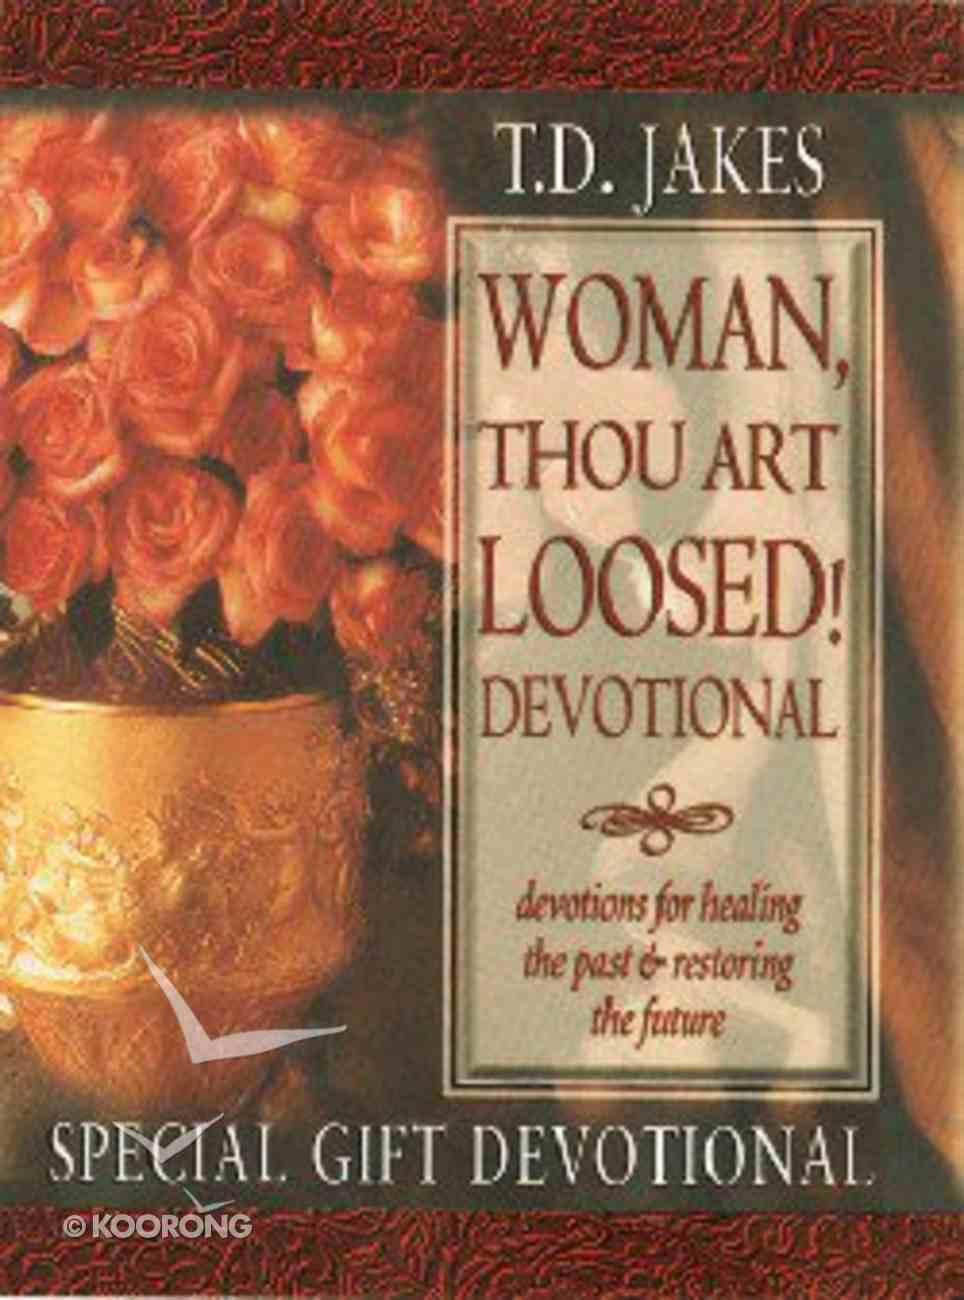 Woman, Thou Art Loosed! (Devotional) Hardback